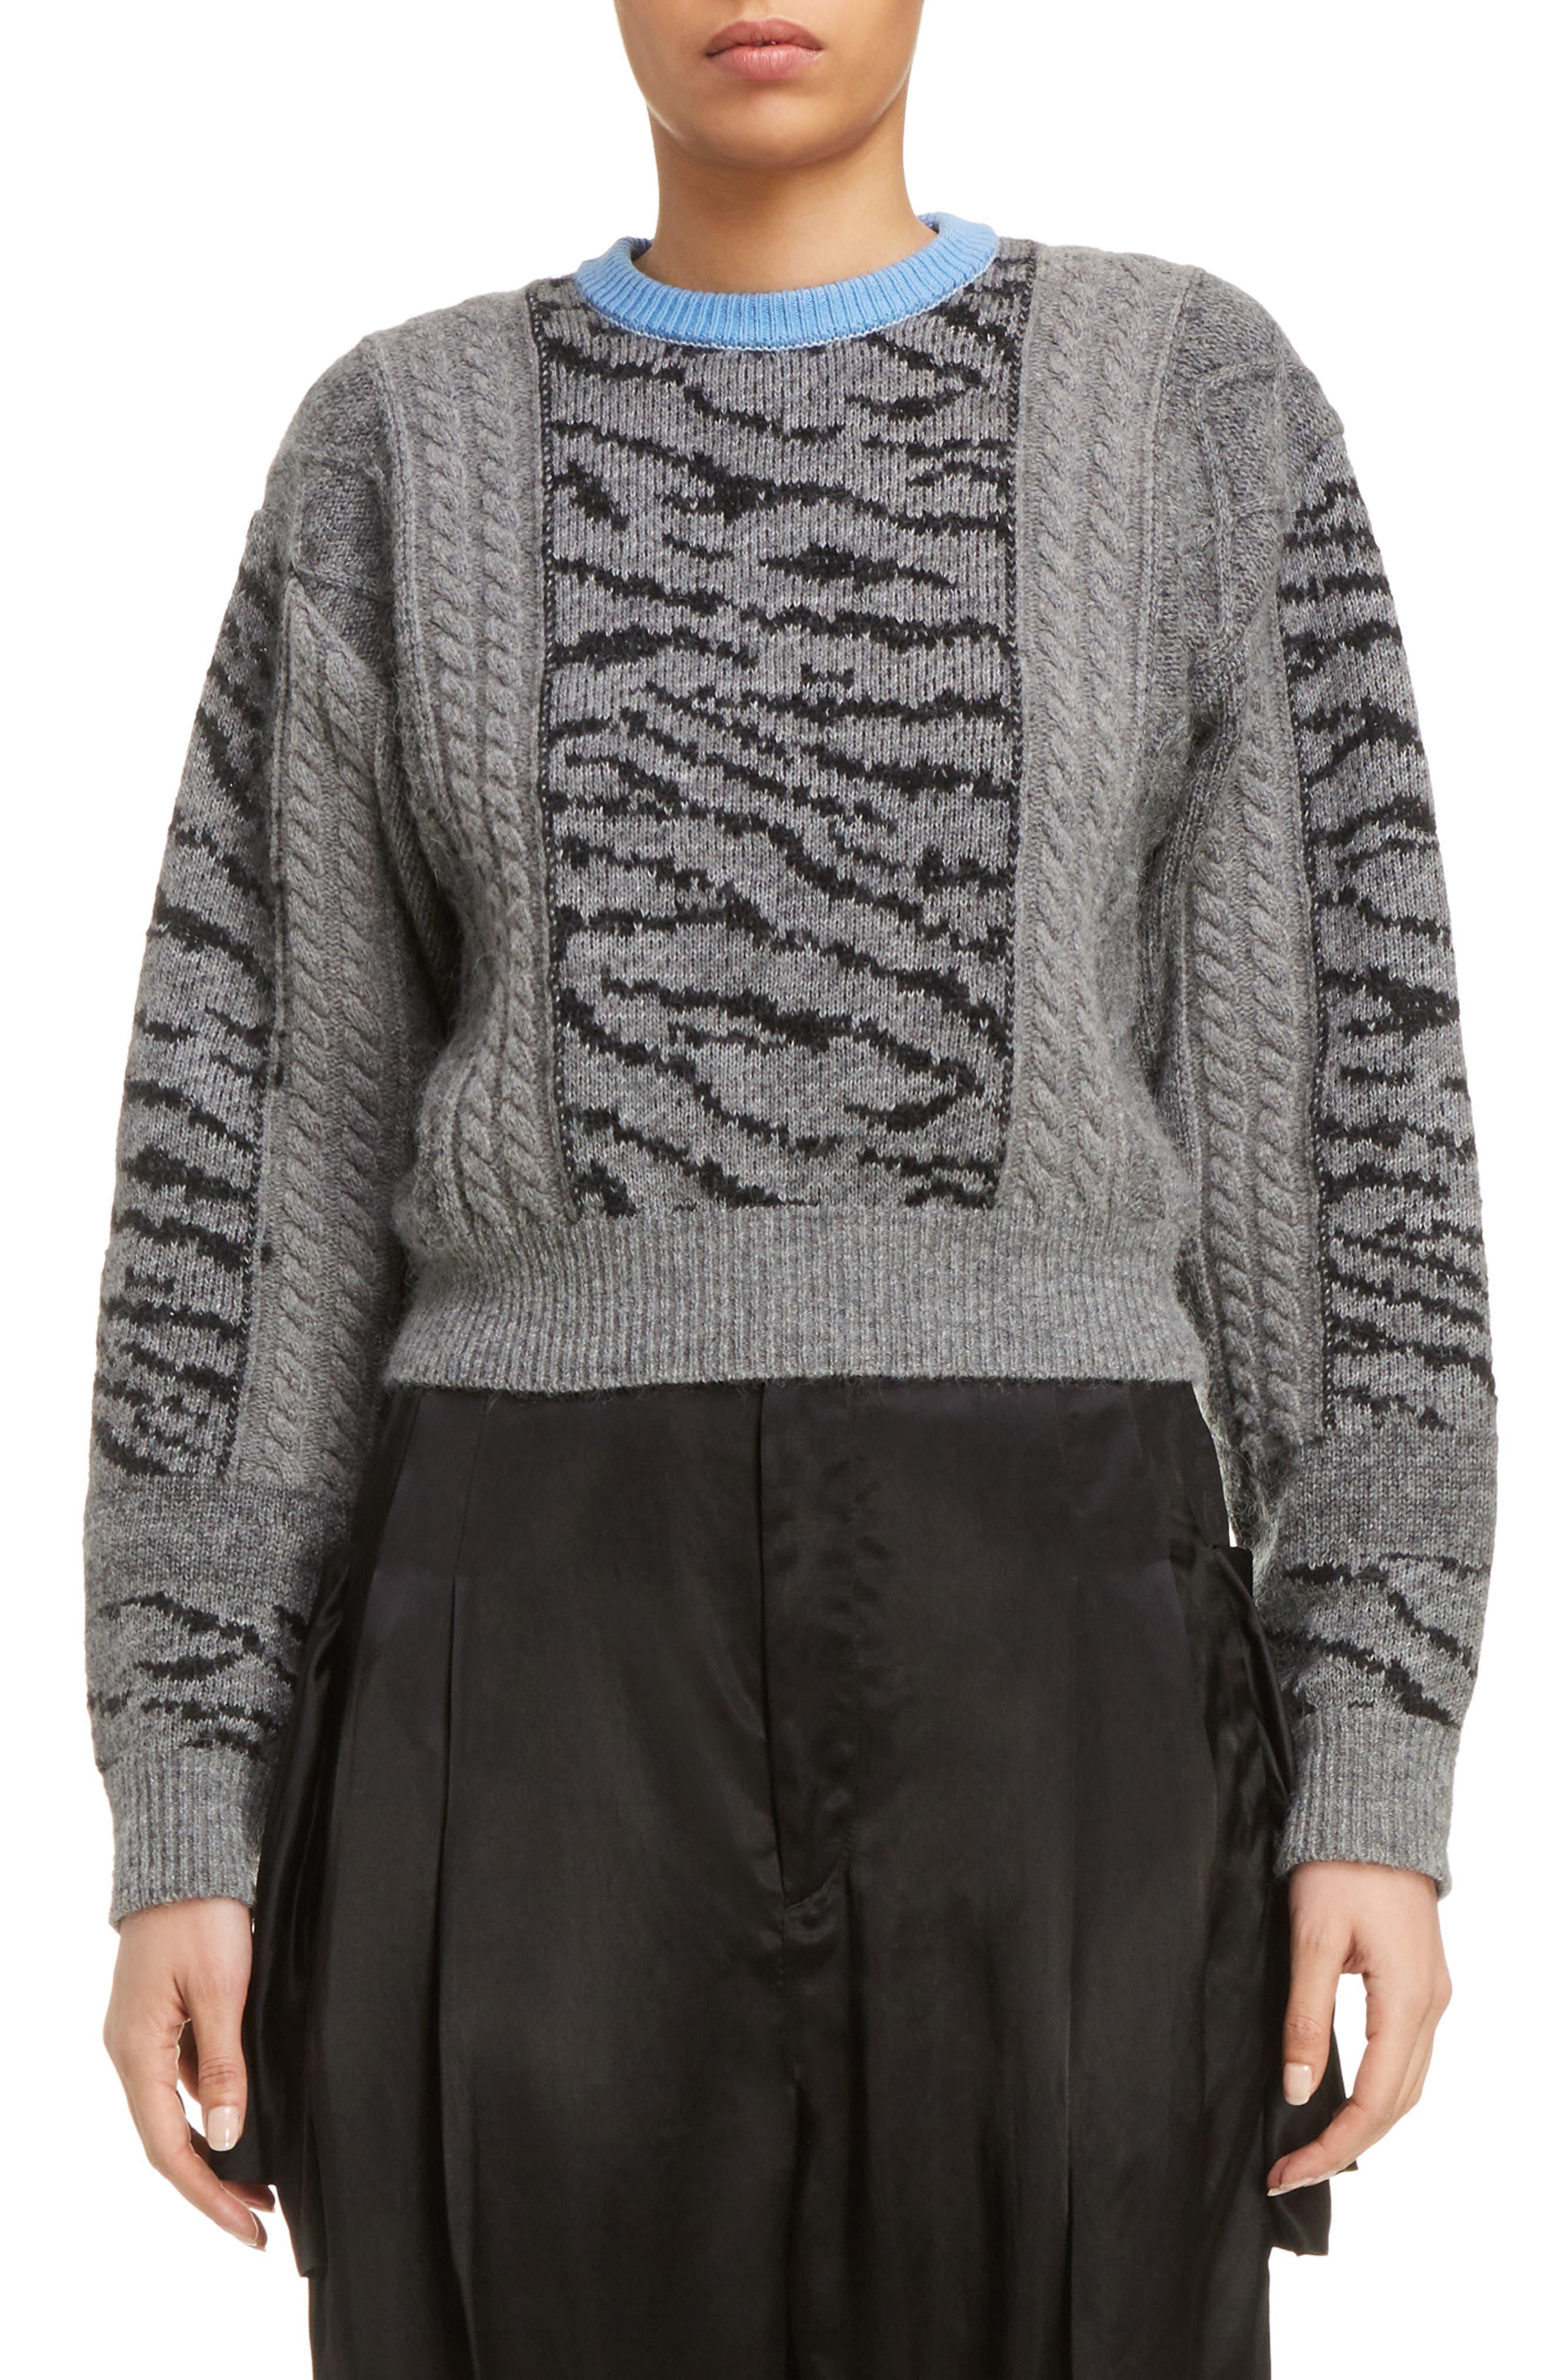 TOGA Tiger Jacquard Knit Sweater